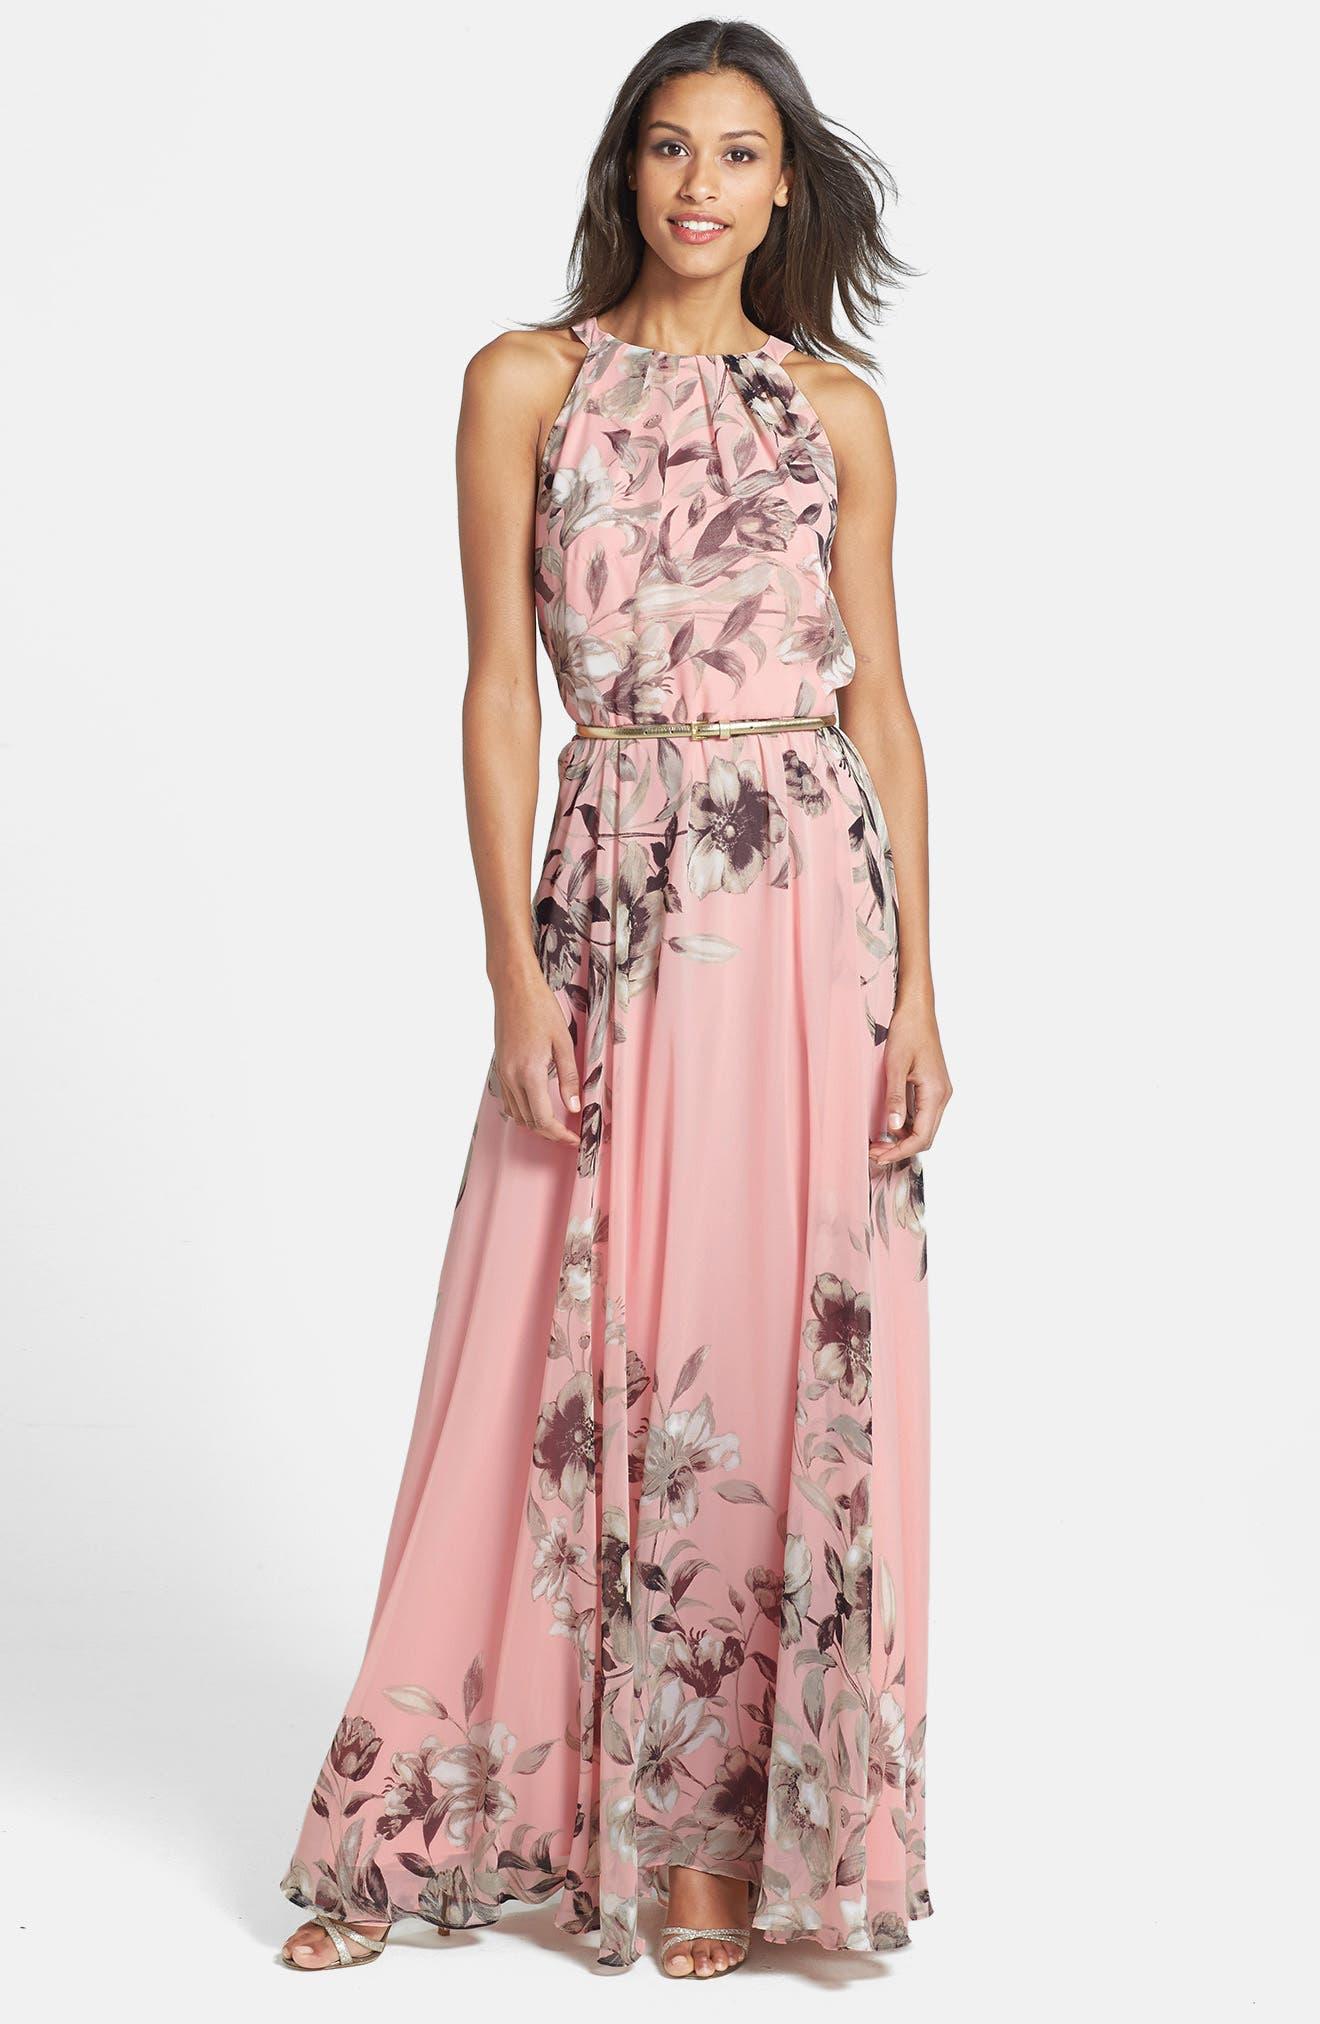 Belted Chiffon Maxi Dress,                             Alternate thumbnail 10, color,                             PINK MULTI